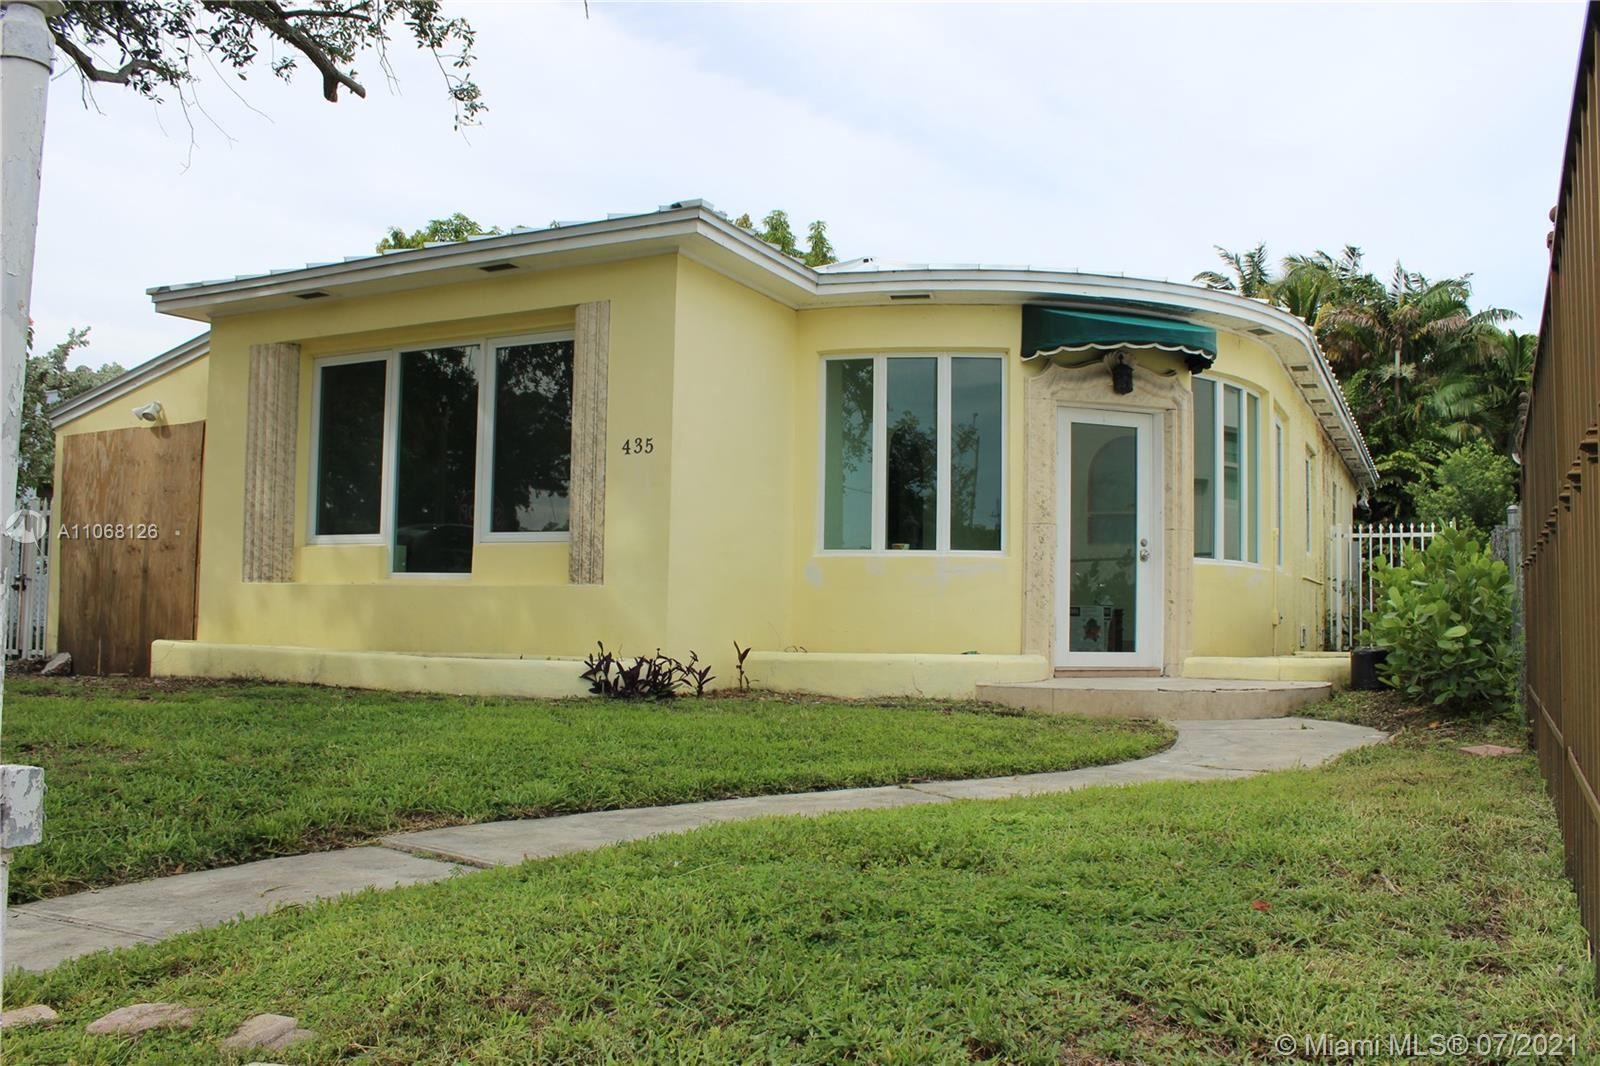 435 SW 31st Rd, Miami, FL 33129 - #: A11068126